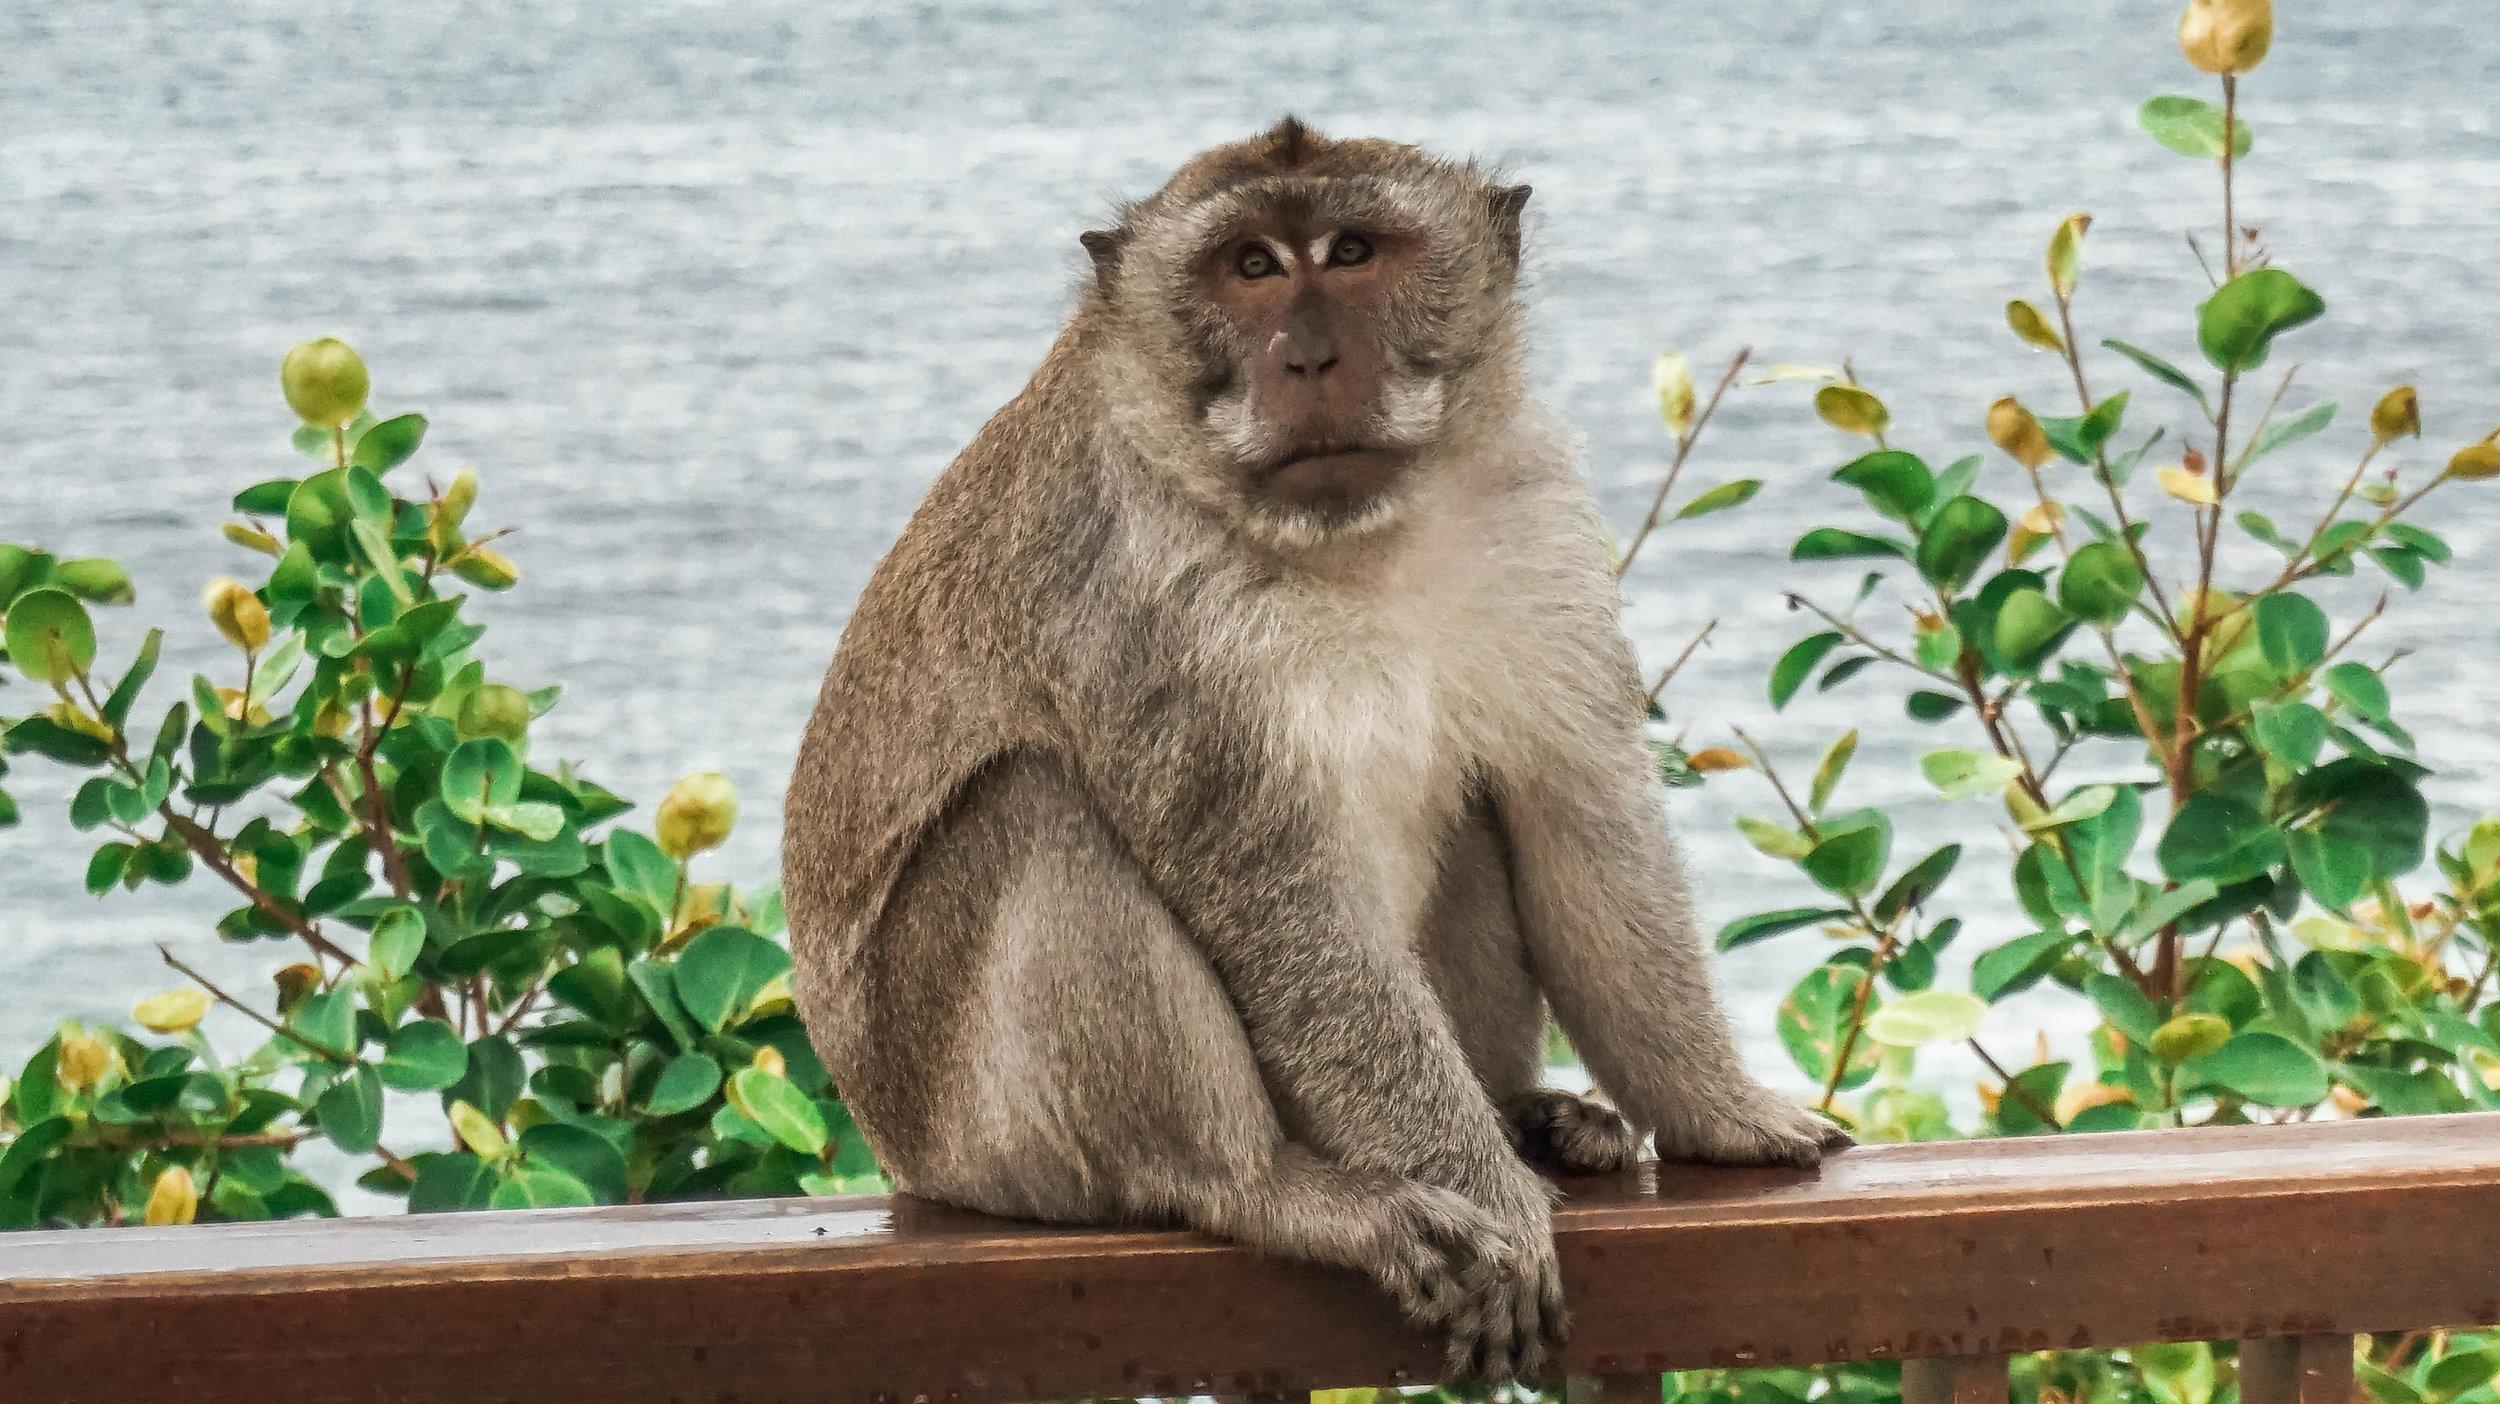 Anantara-uluwatu-bali-resort-monkey-2018.jpg